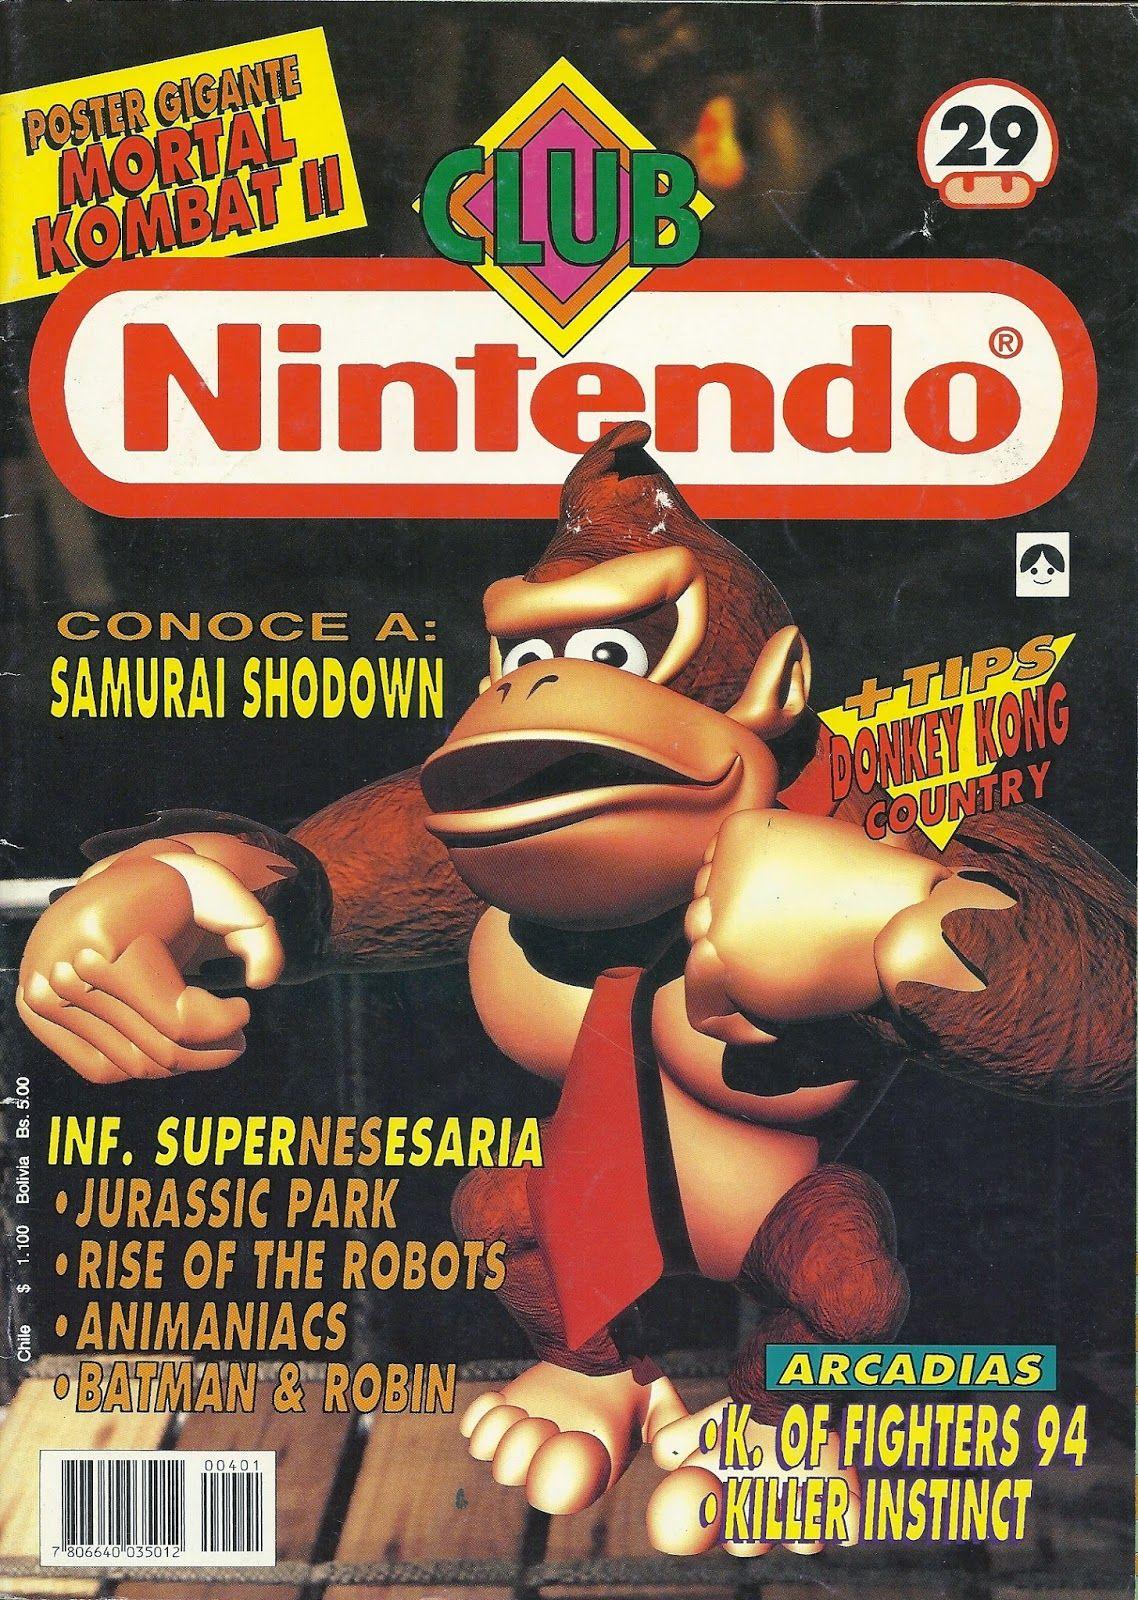 Club Nintendo Año 04 Nº 29 Donkey Kong Country (SNES) Enero 1995 Español Chile